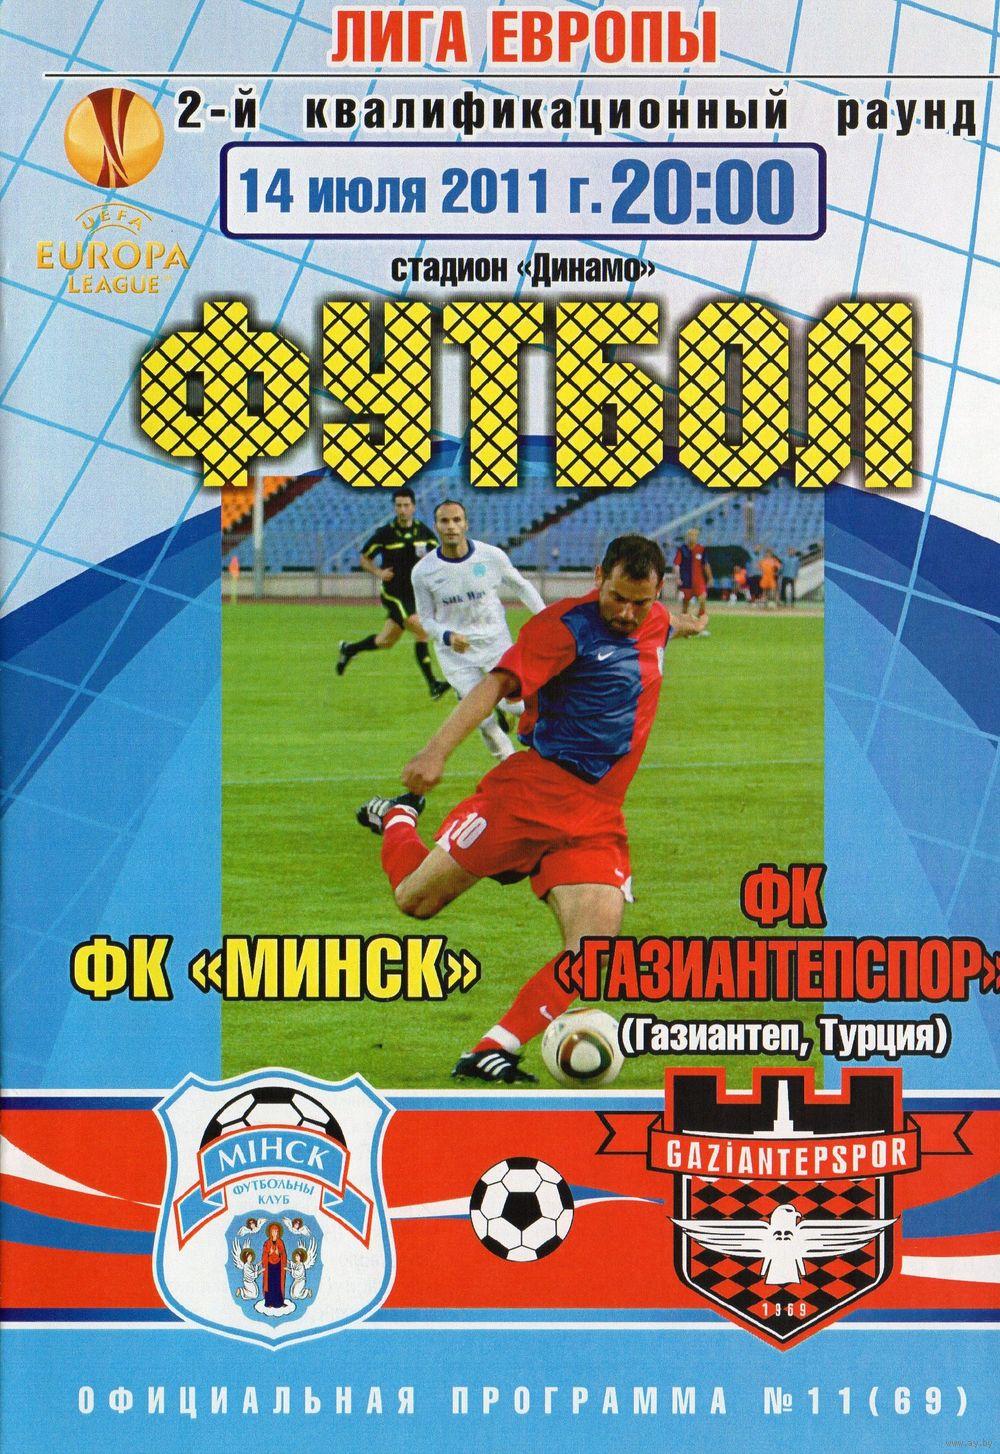 Минск (Белоруссия) - Газиантепспор (Турция) 1:1